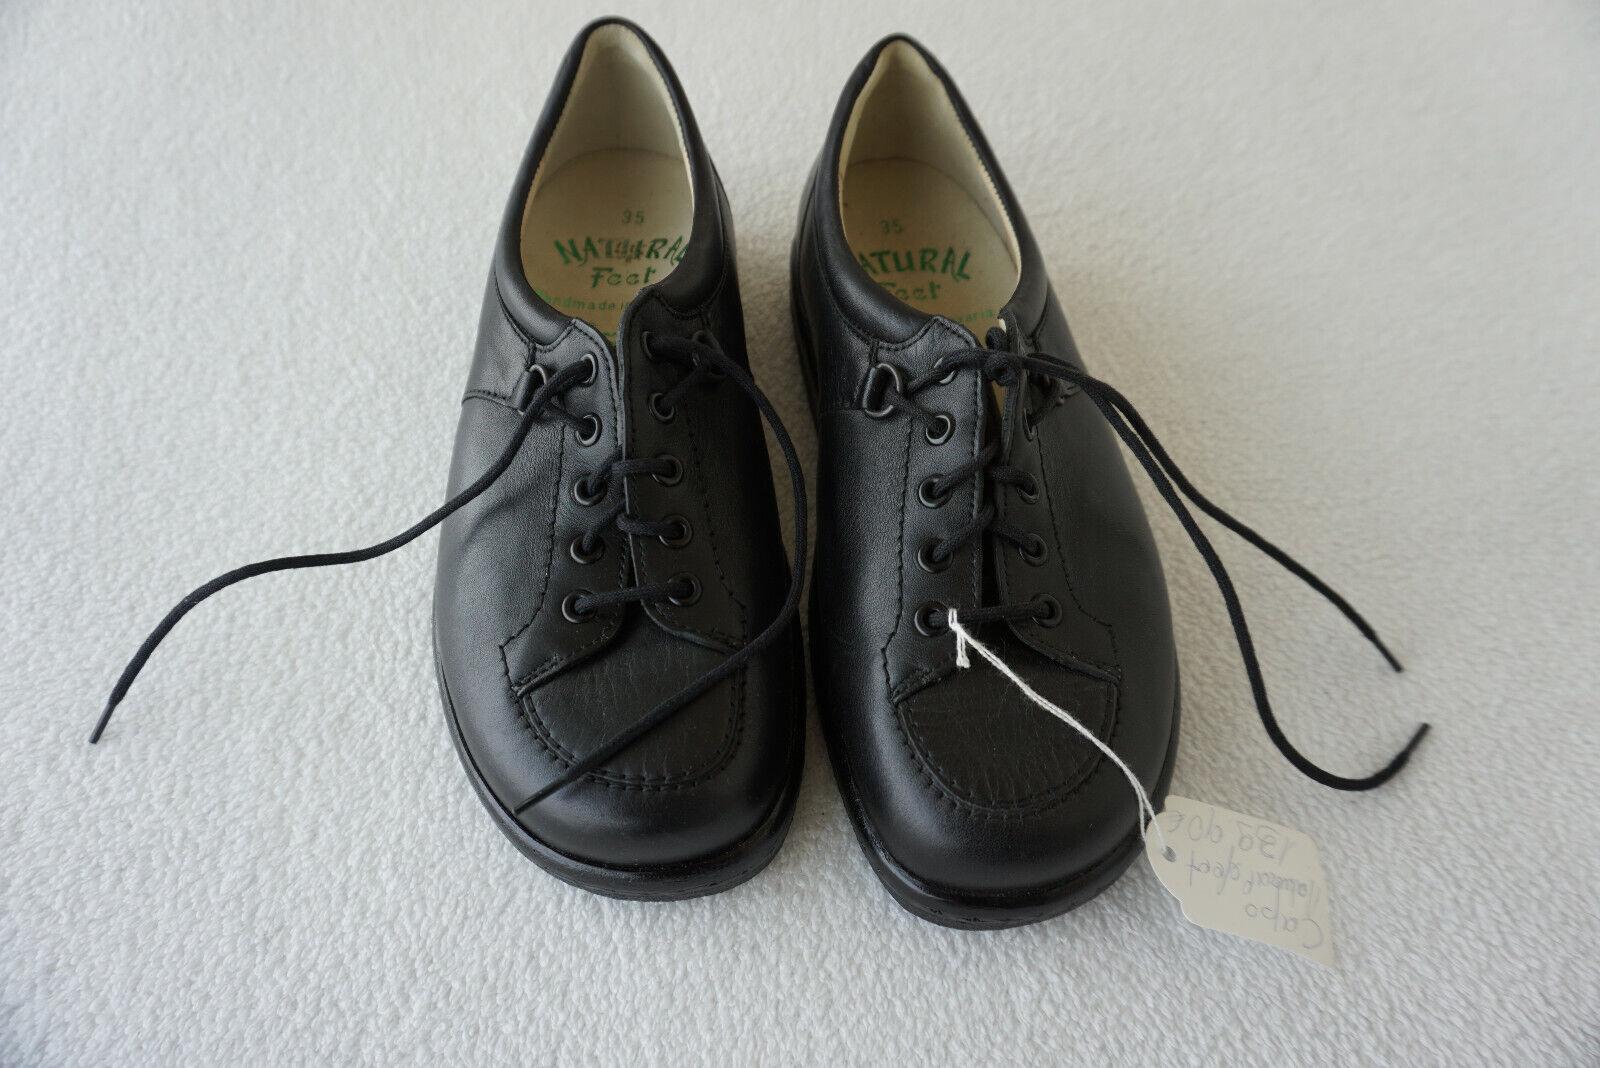 Orthopédiques Natural Feet Femmes Sandale Chaussures confortables taille 35 Noir Cuir Neuf